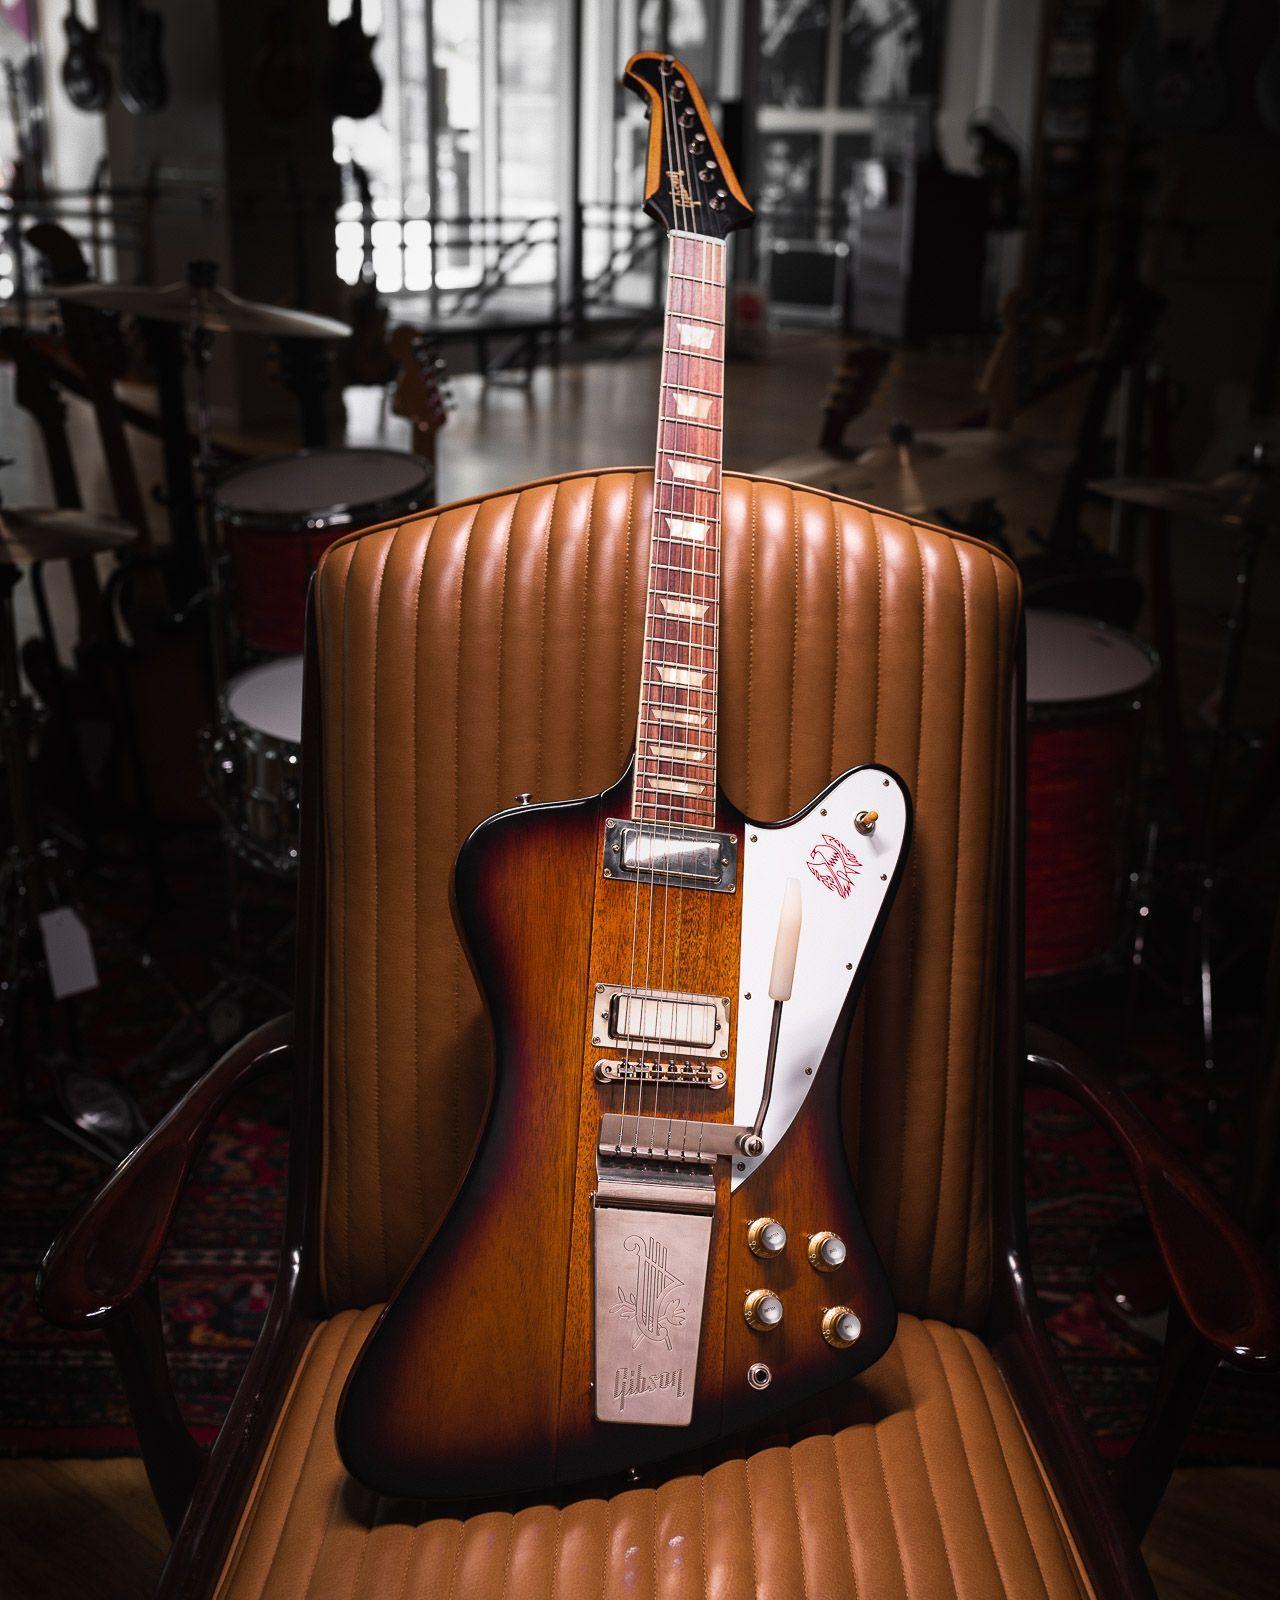 Gibson Custom 1963 Firebird V Vintage Sunburst Light Back Vos M2m W Maestro Vibrola Serial 190125 In 2020 Gibson Firebird Guitar Vintage Electric Guitars